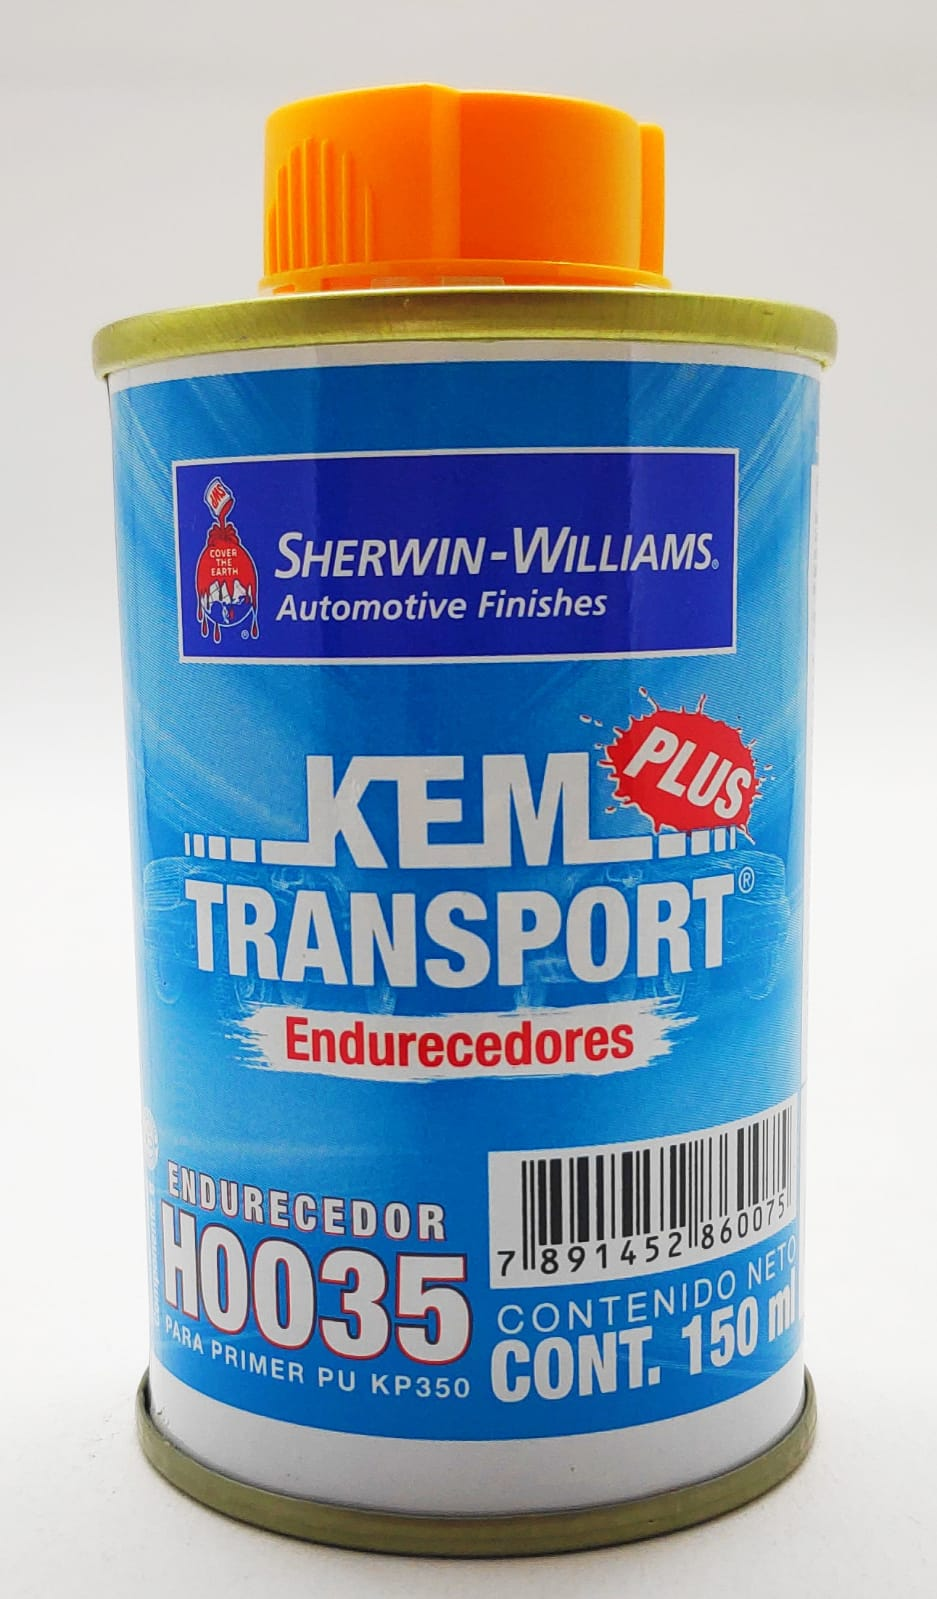 Catalisador Primer PU KP350 150ml - Sherwin Williiams